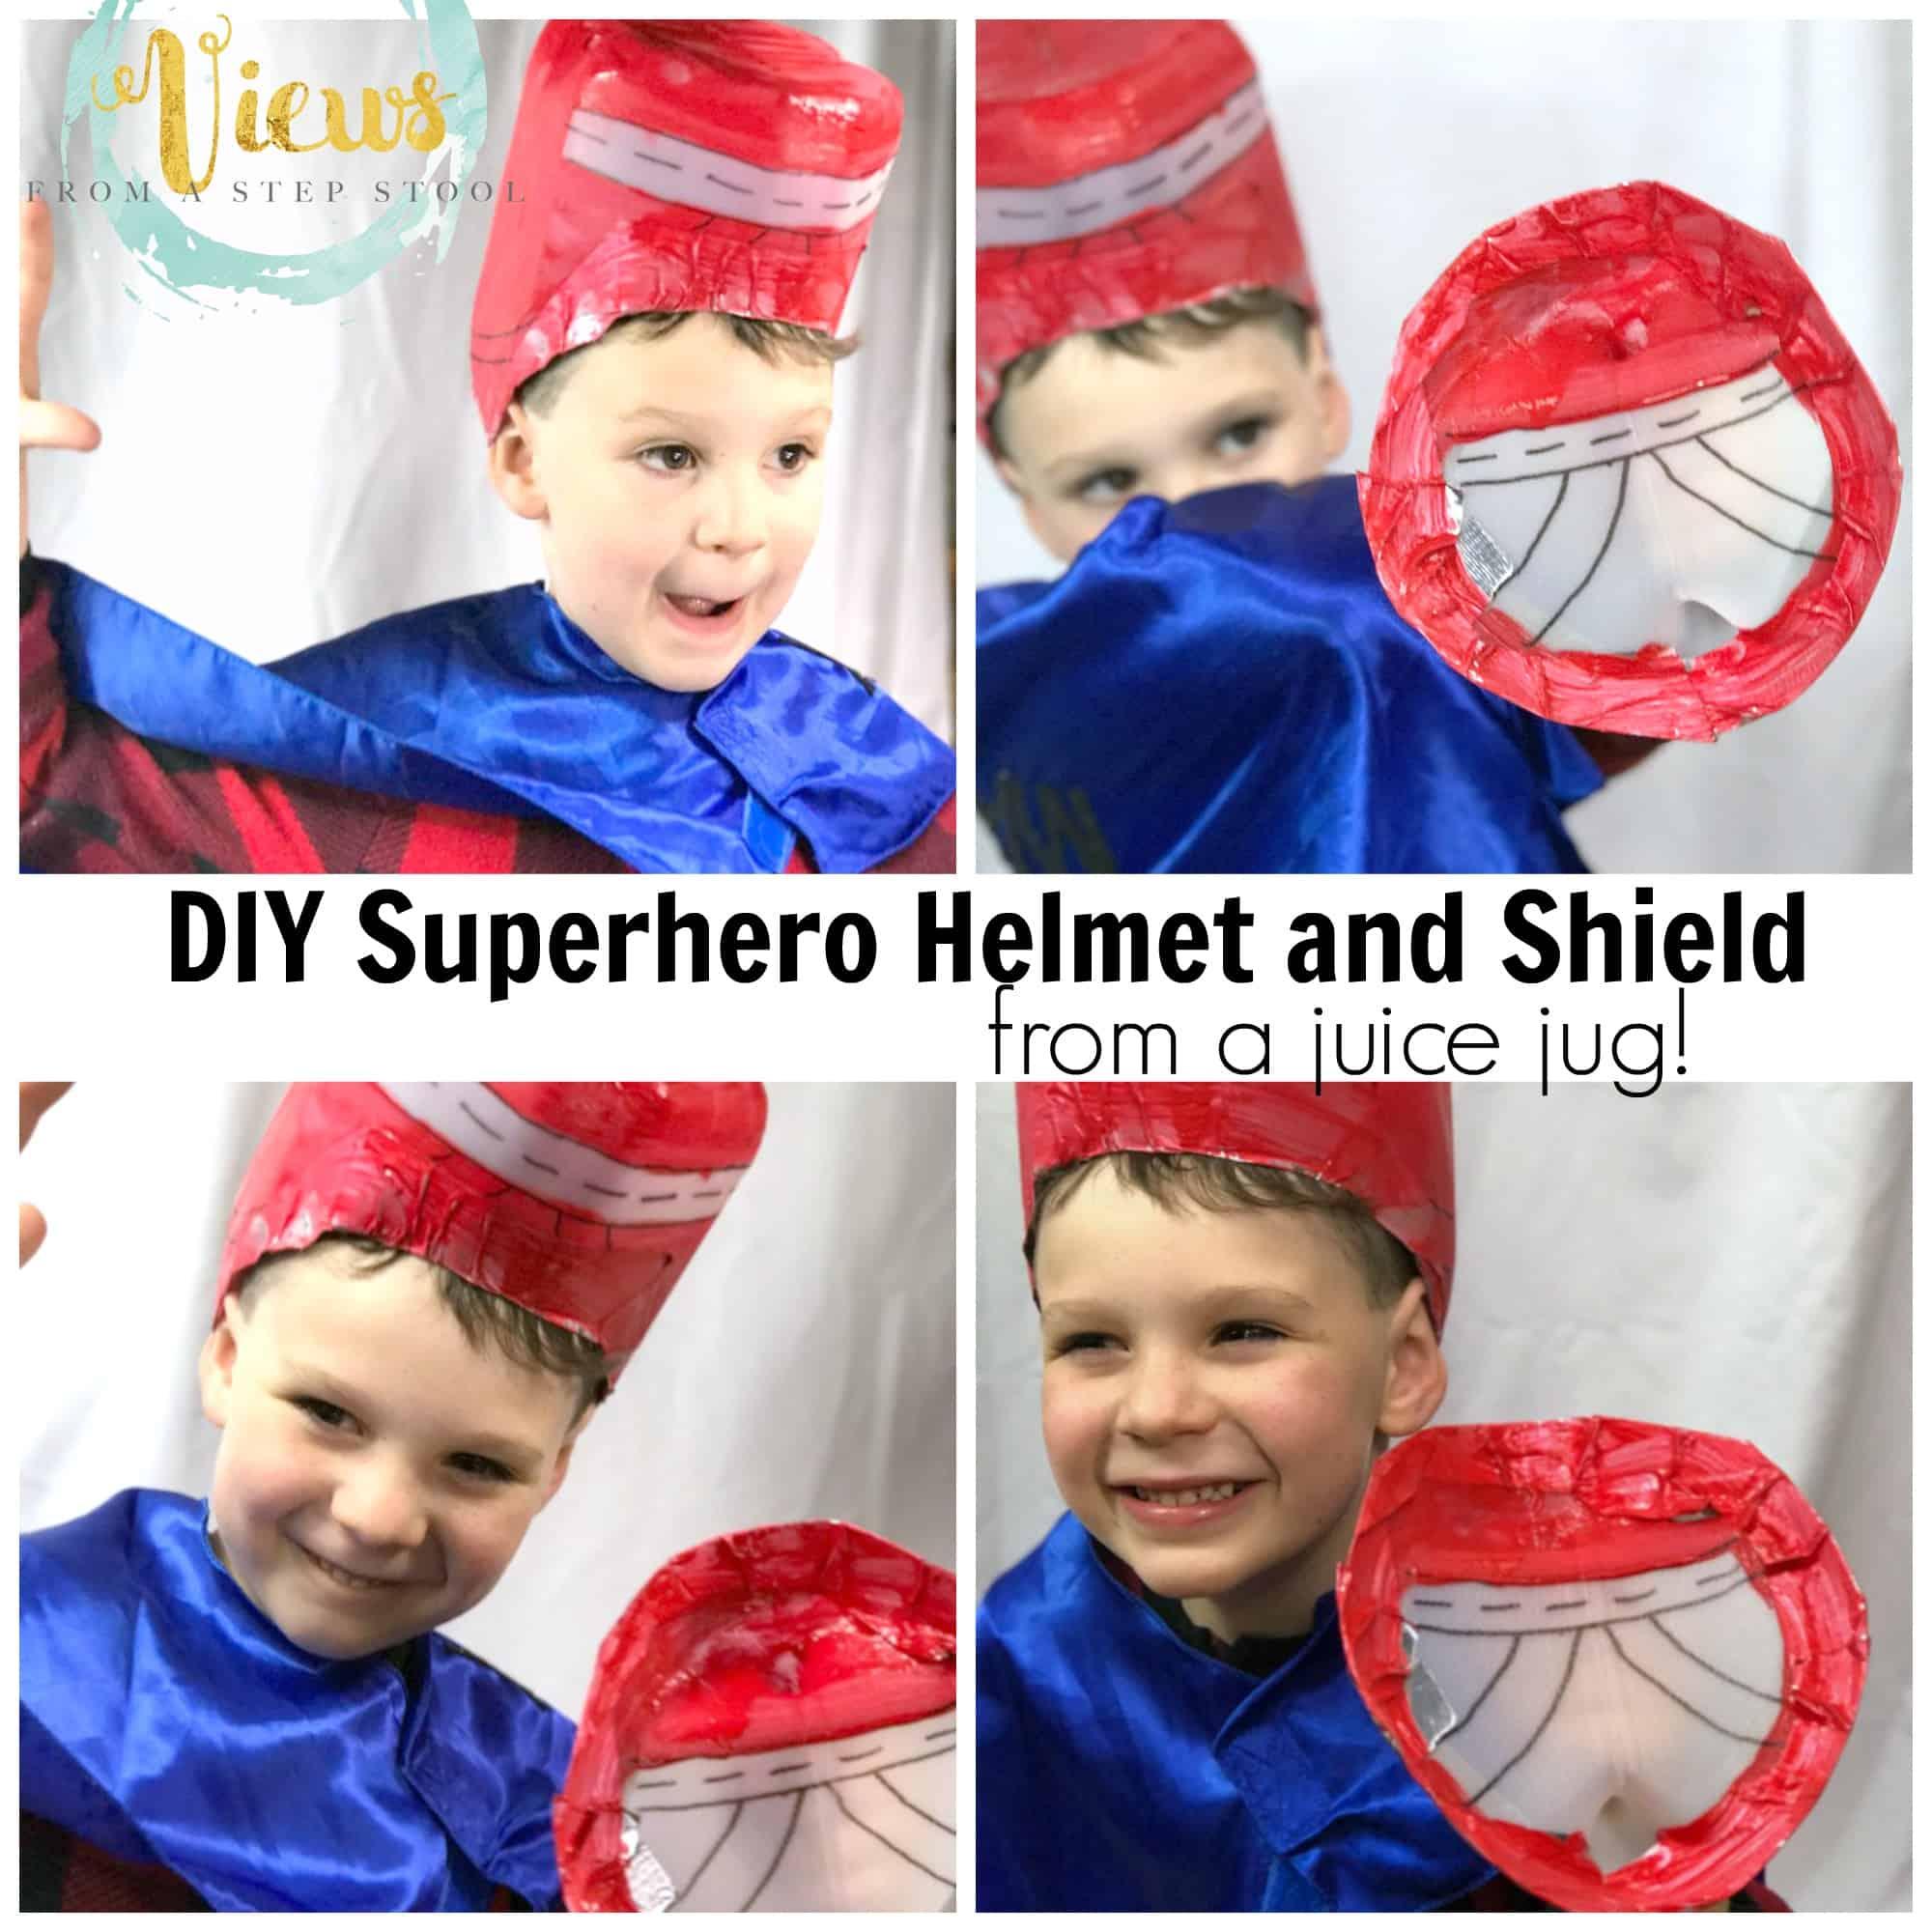 Turn an ordinary plastic jug into DIY superhero costume accessories! Make a superhero helmet and a shield!